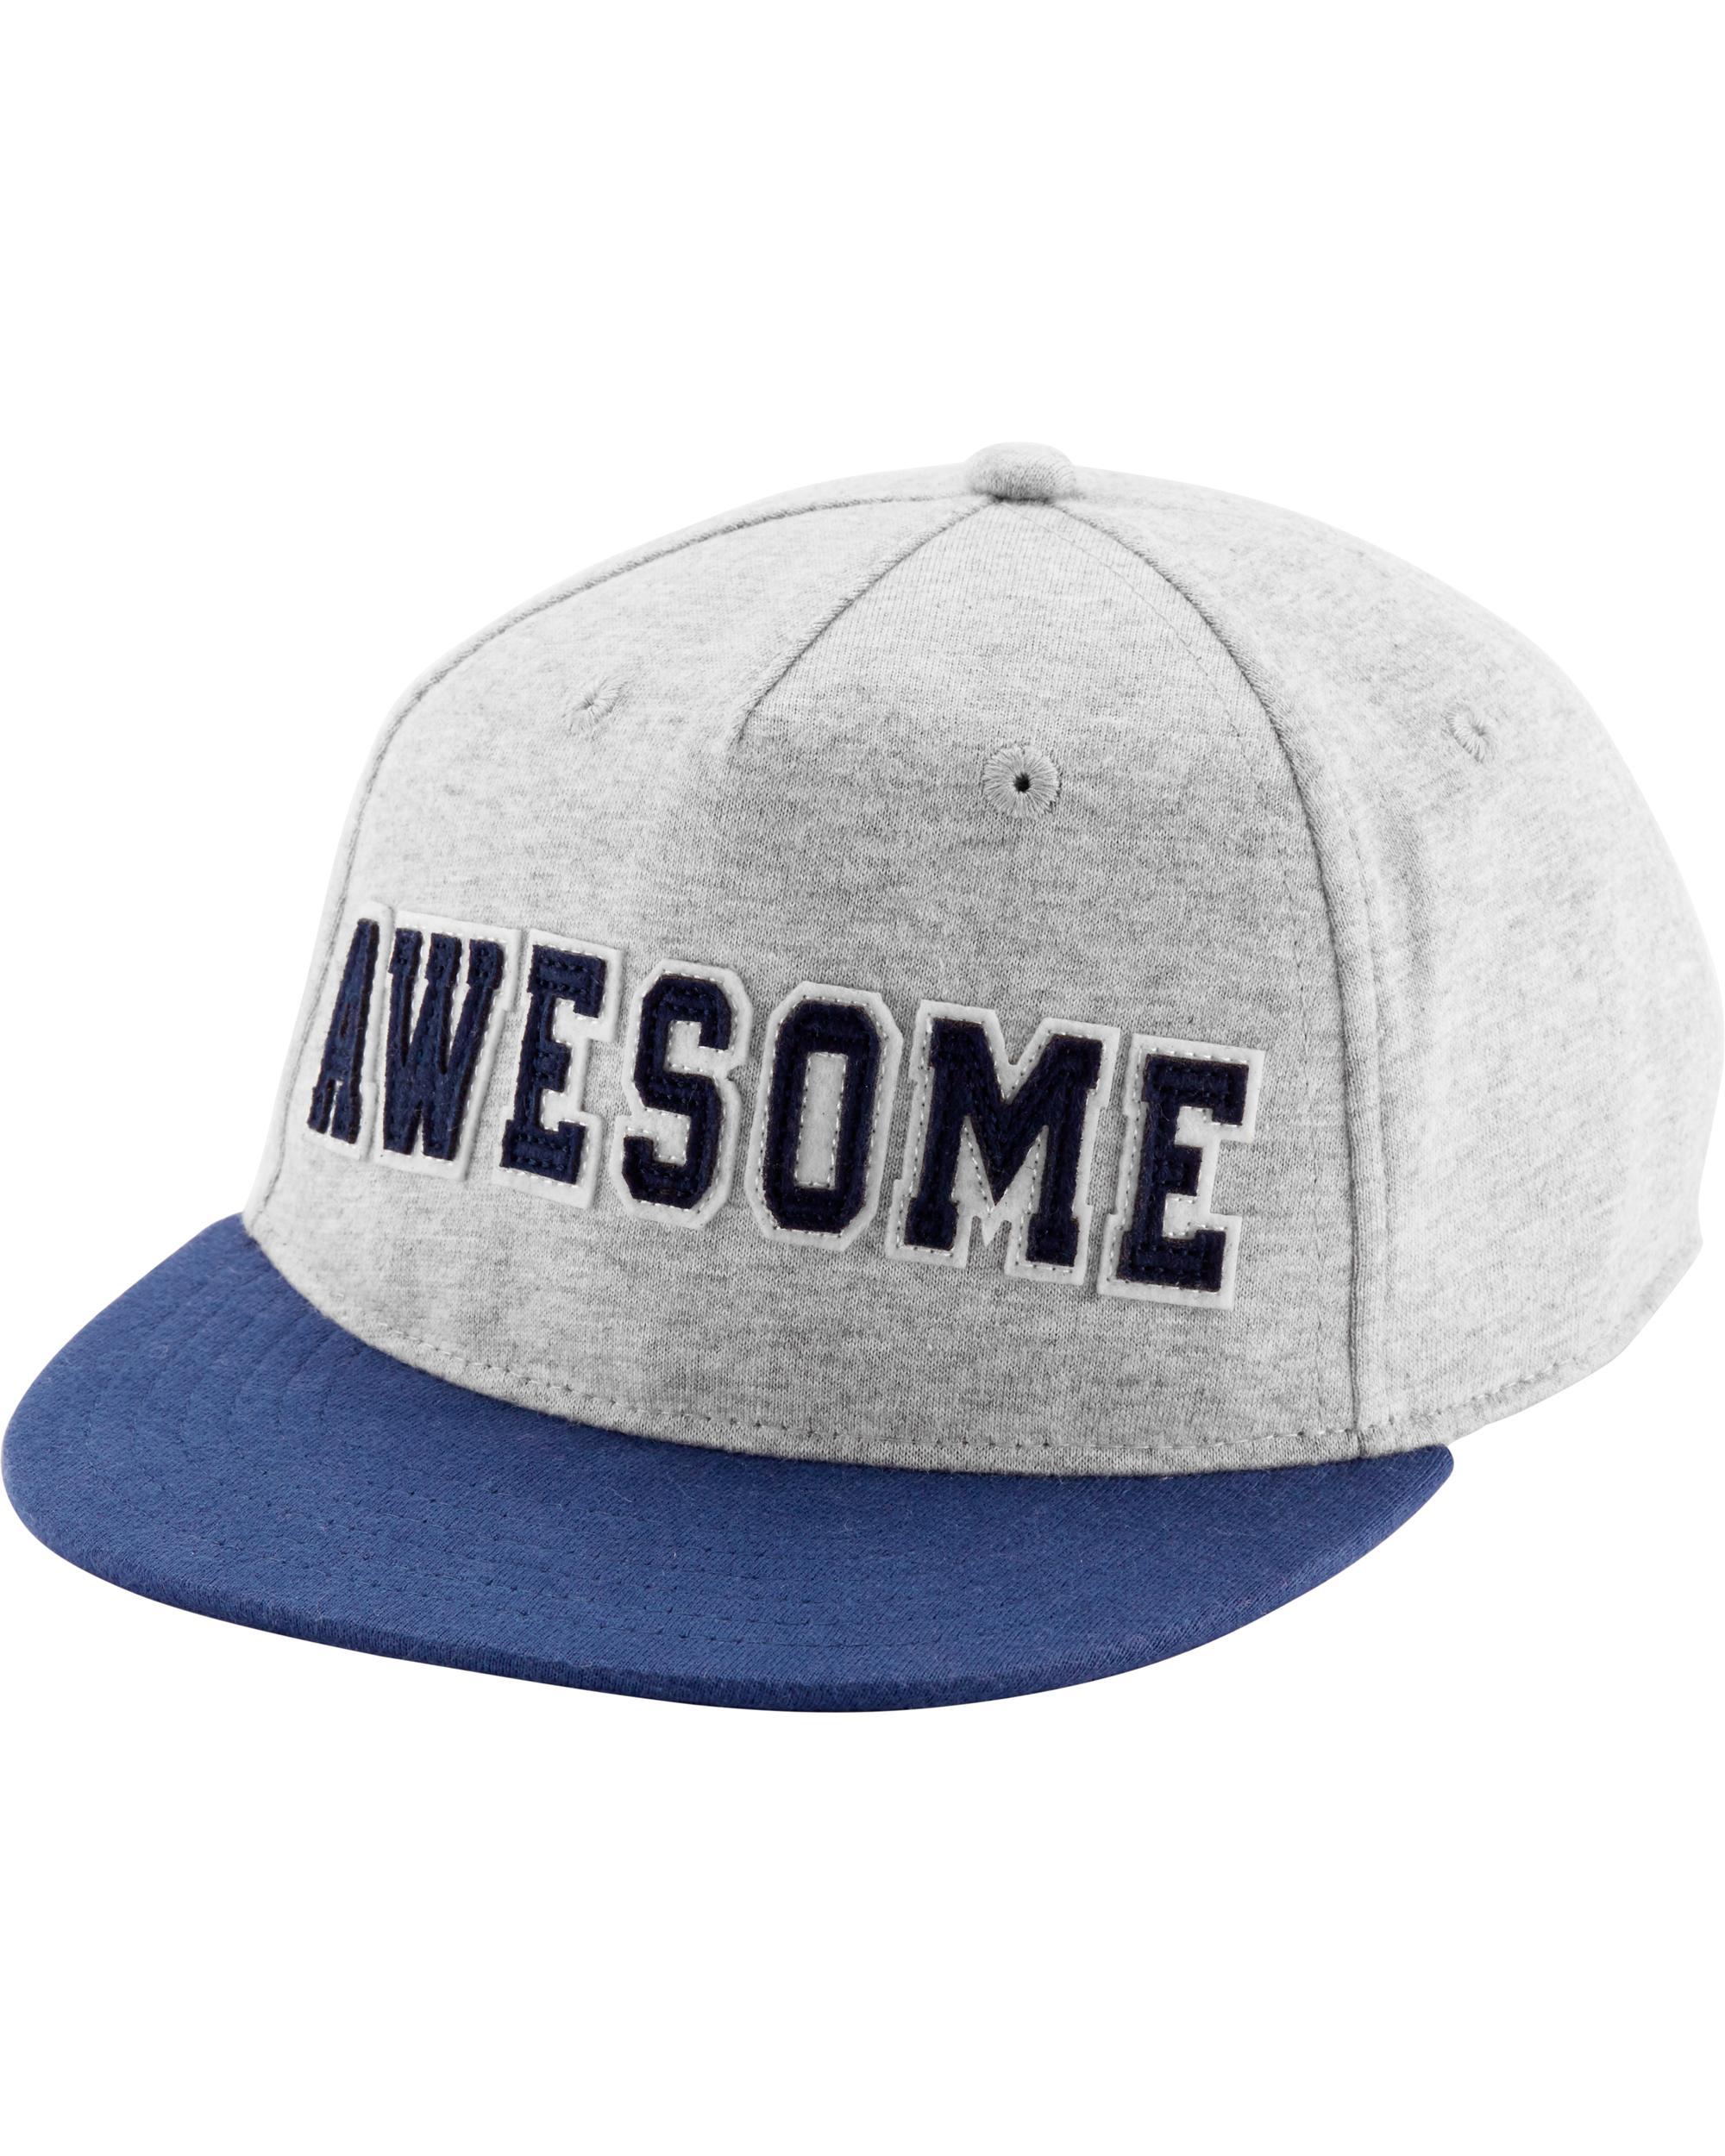 f8545fc3 Awesome Baseball Hat | carters.com